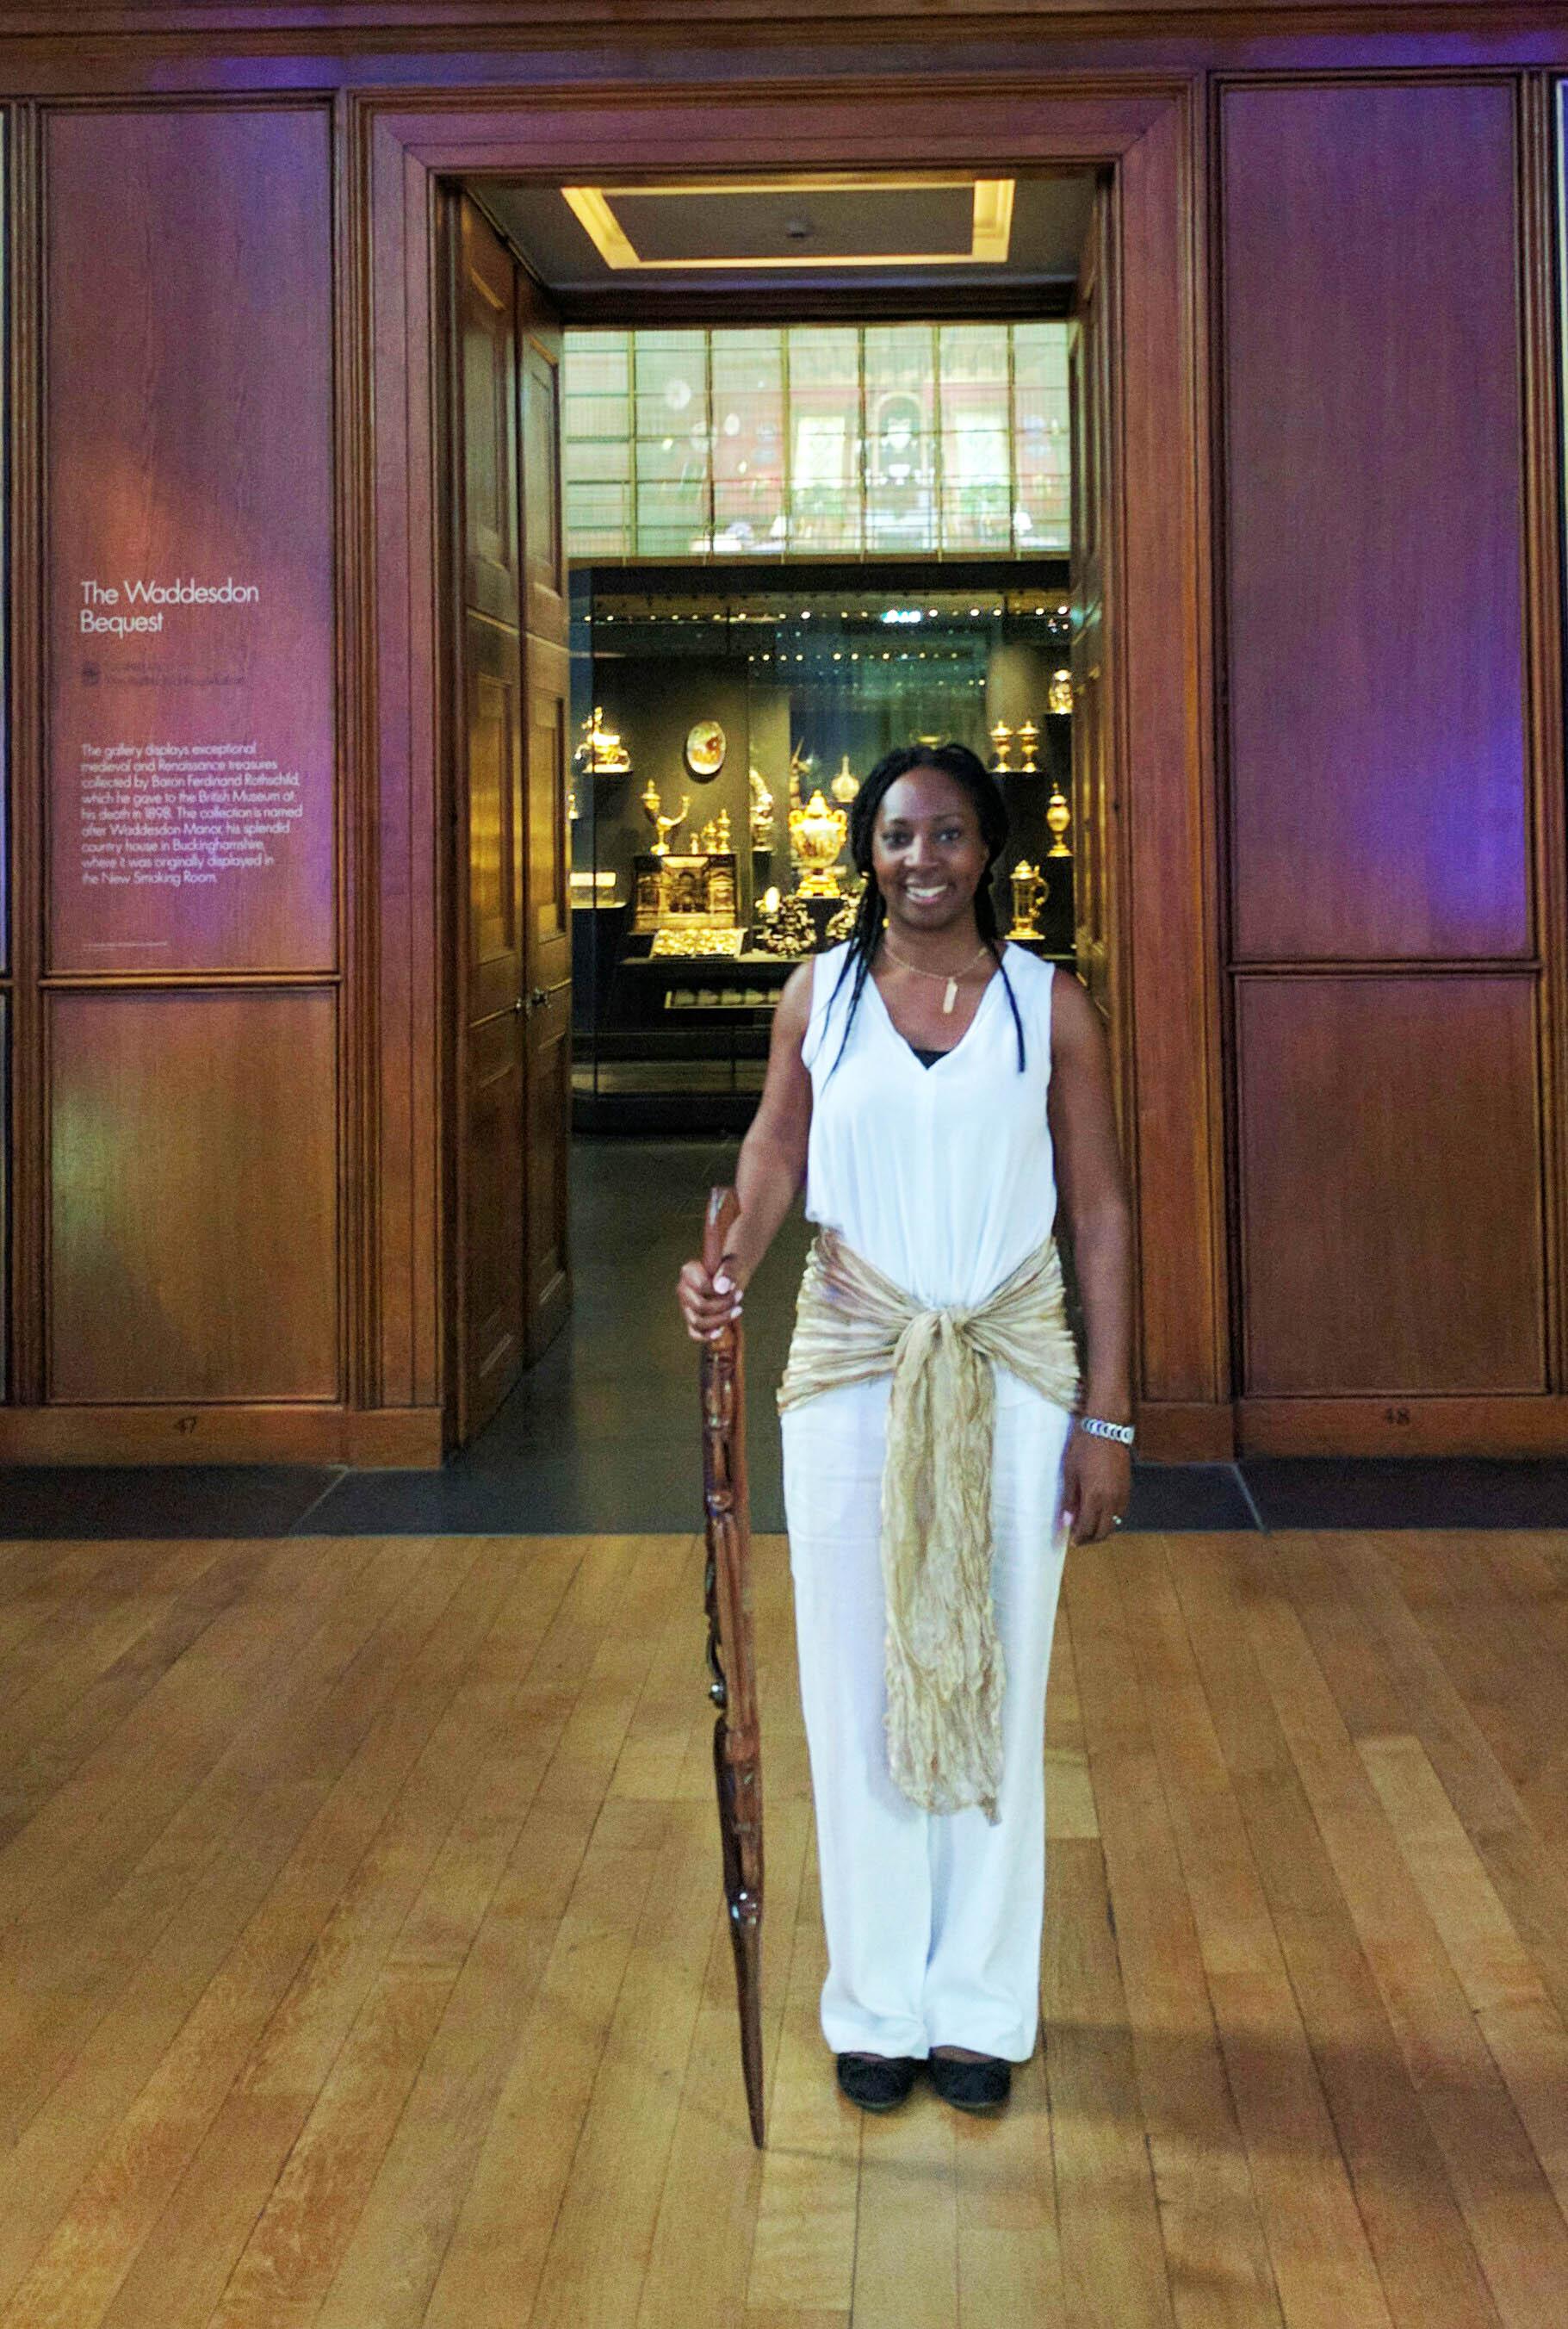 Storytelling at the British Museum - Wendy Shearer